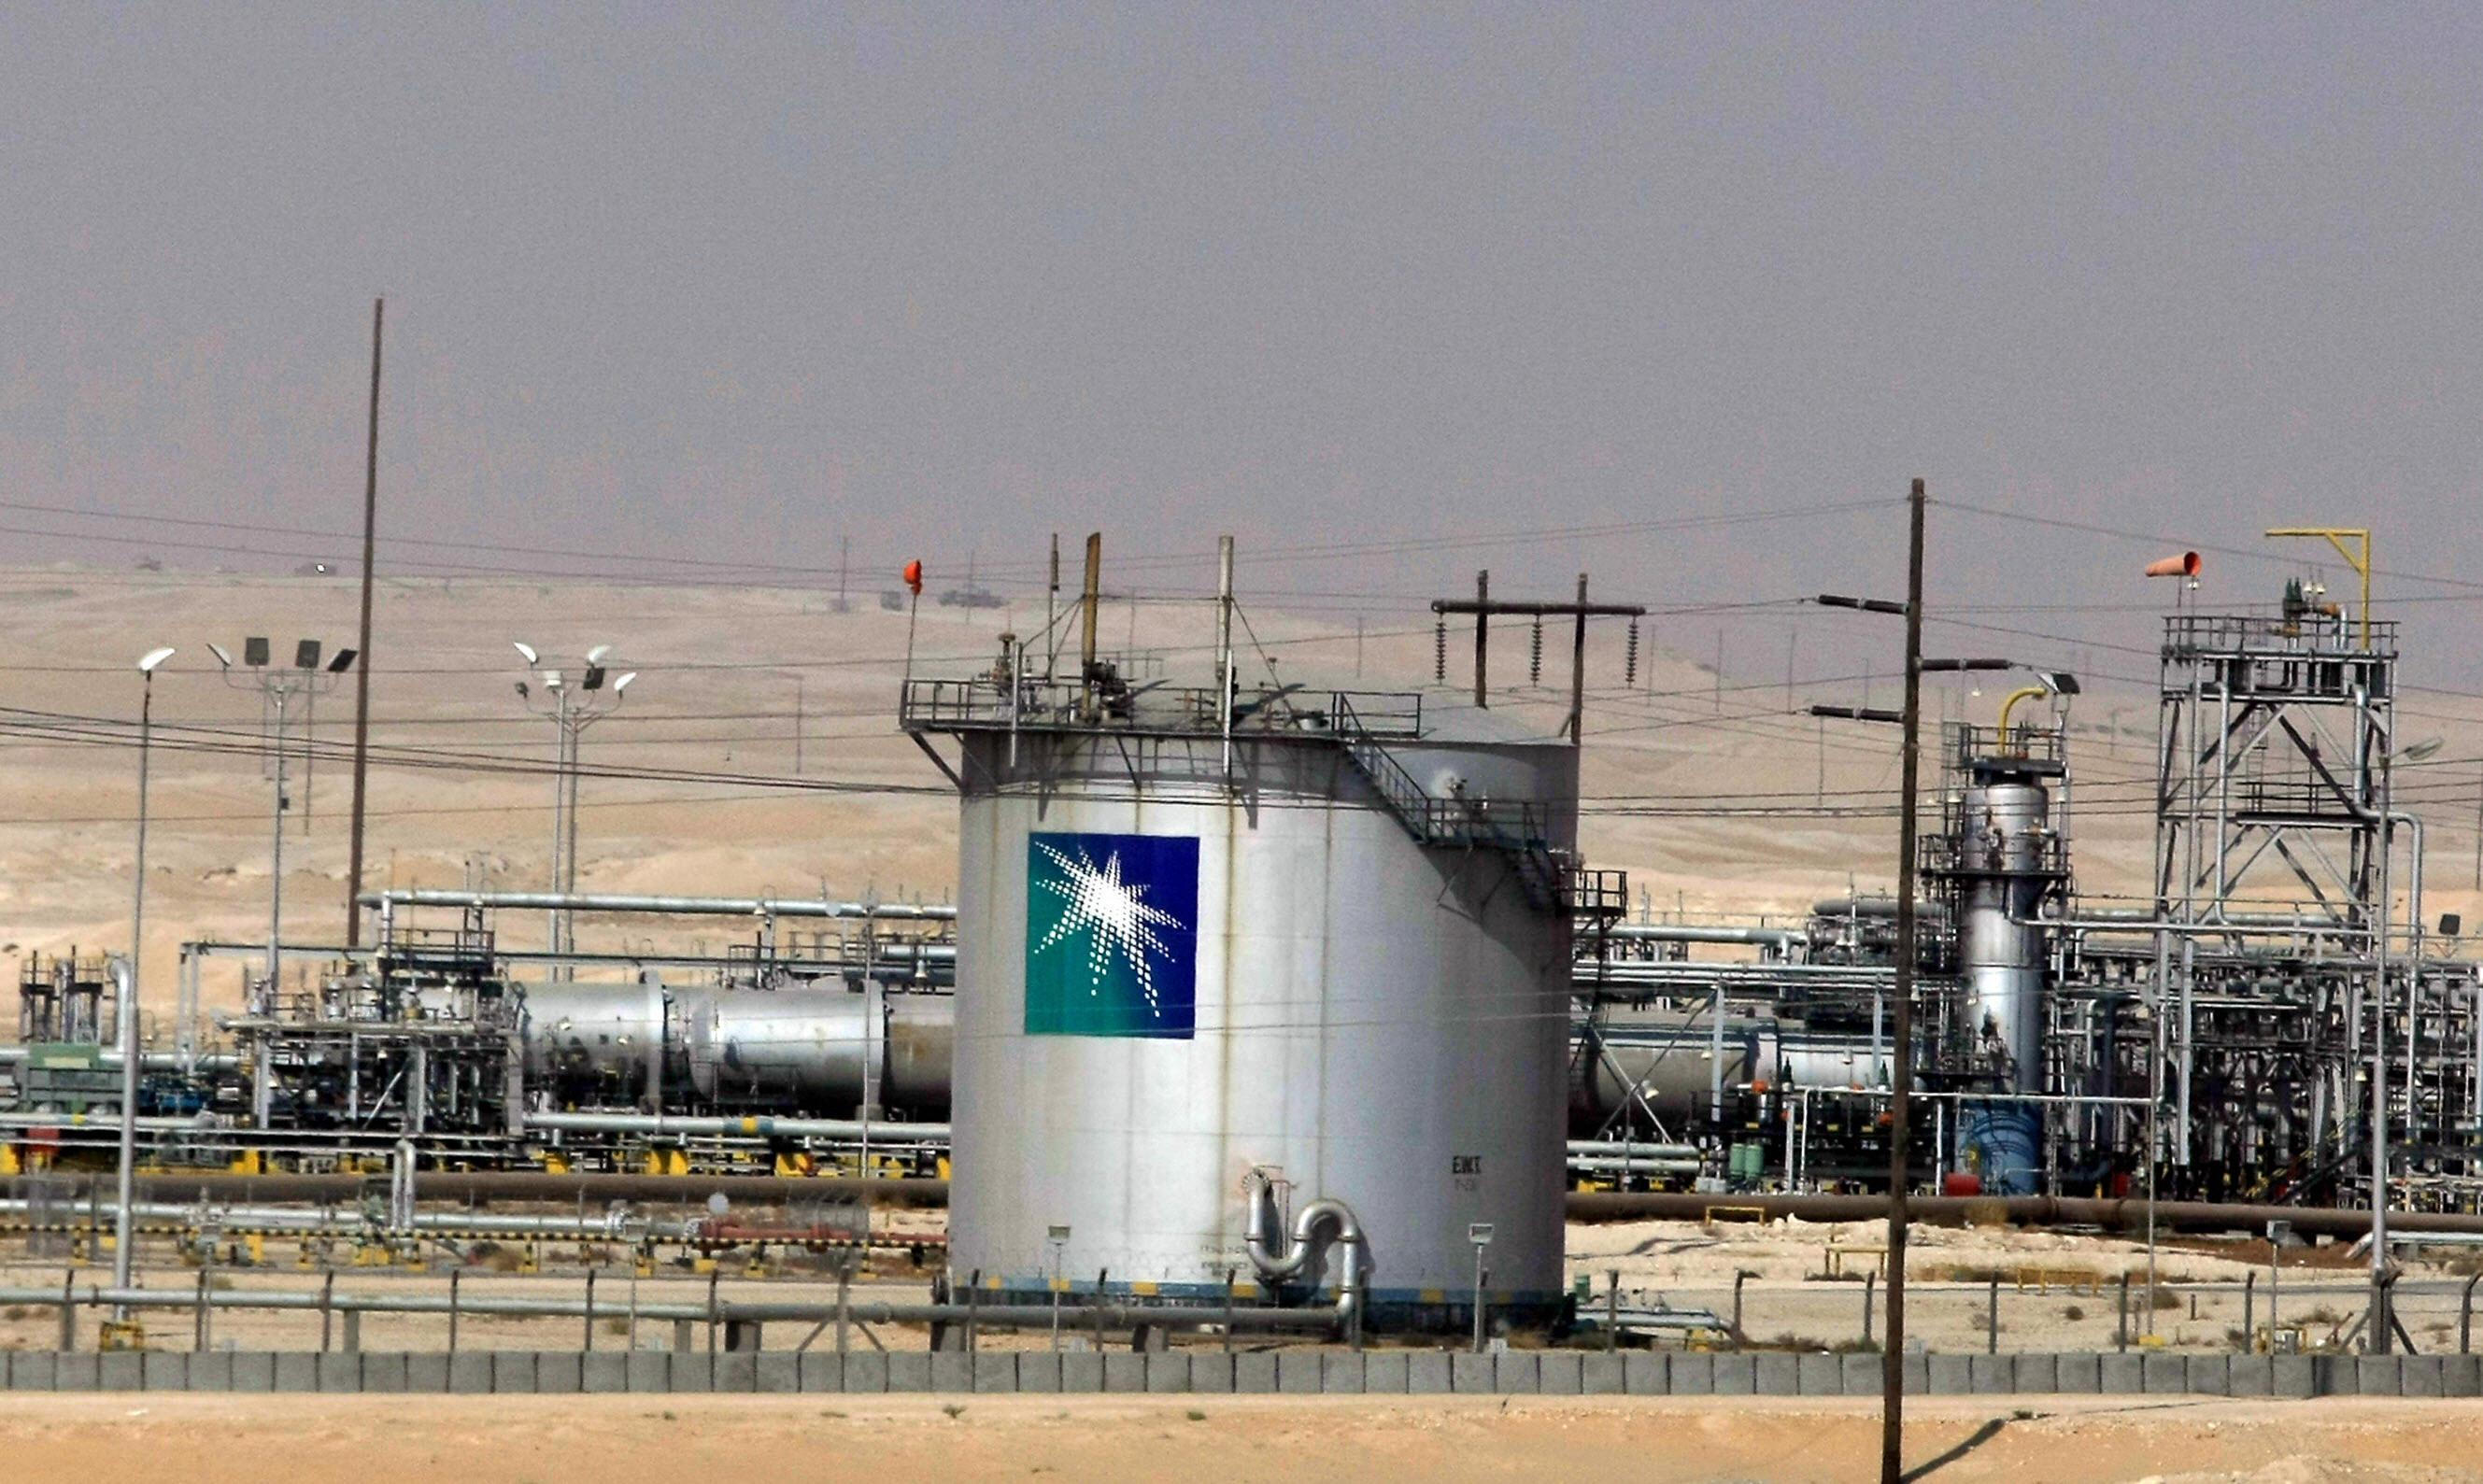 Saudi Arabia, crude oil prices, petrol price